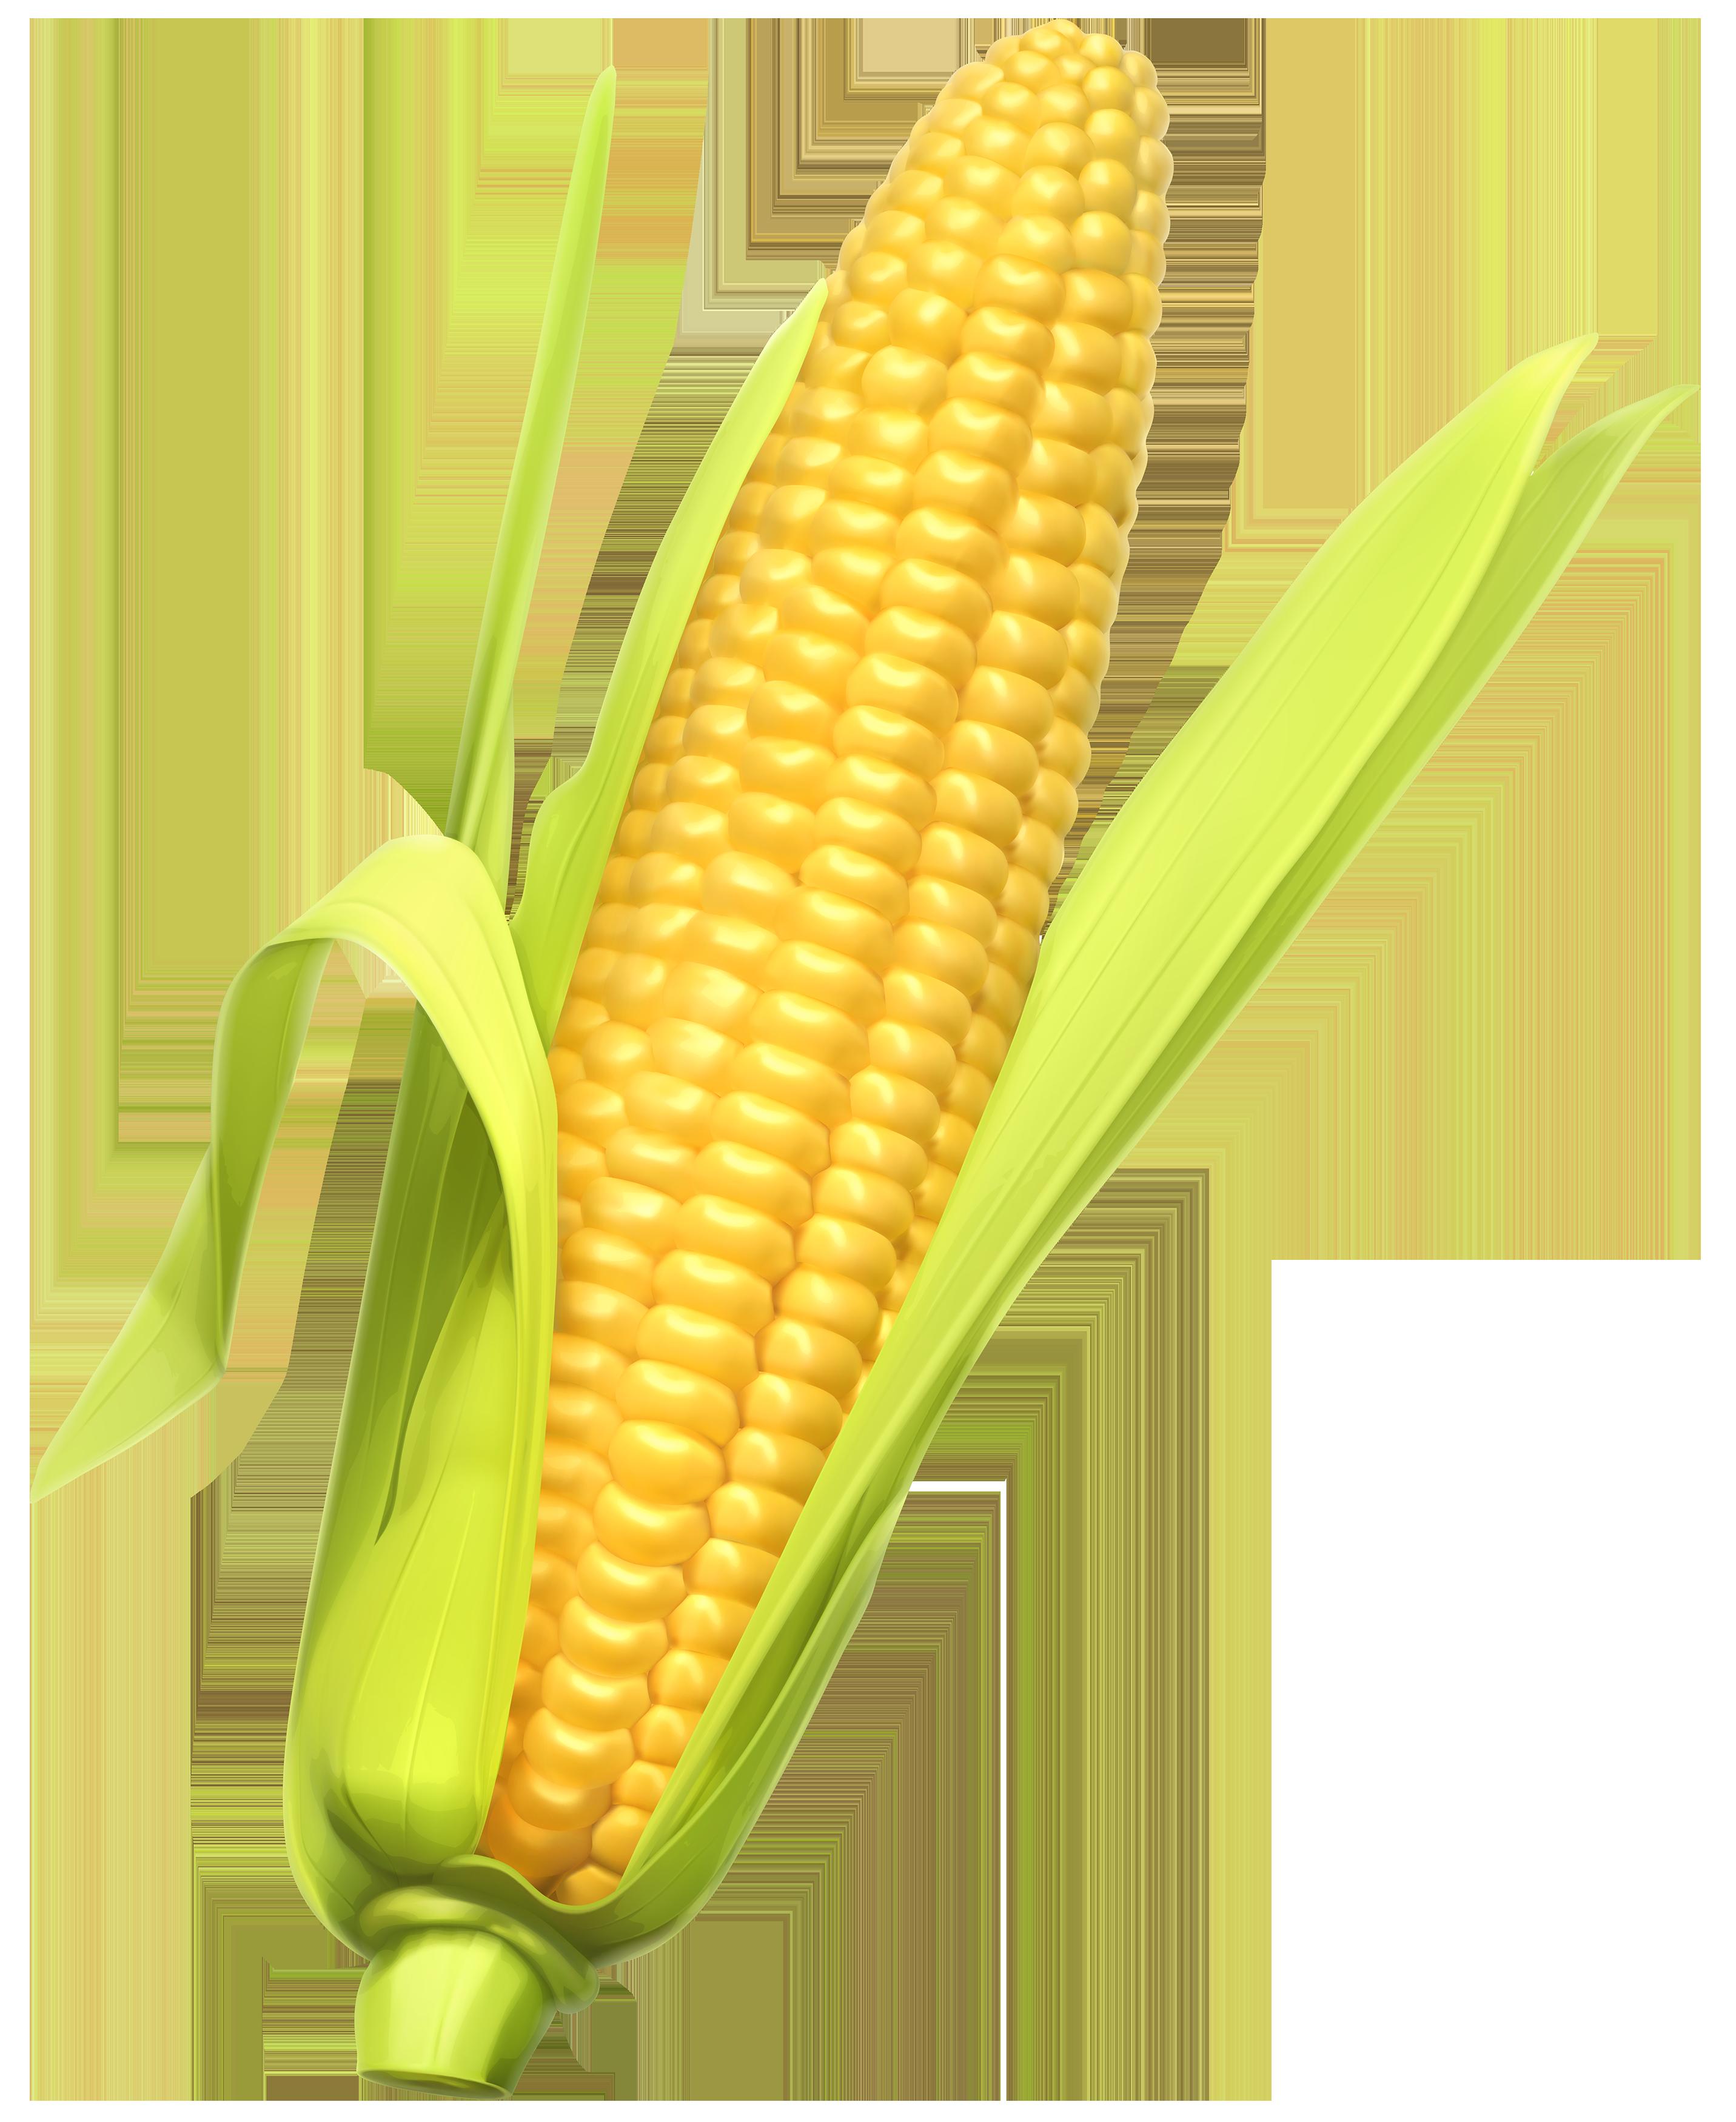 2863x3500 Corn Clip Art Free Clipart Images 4 3